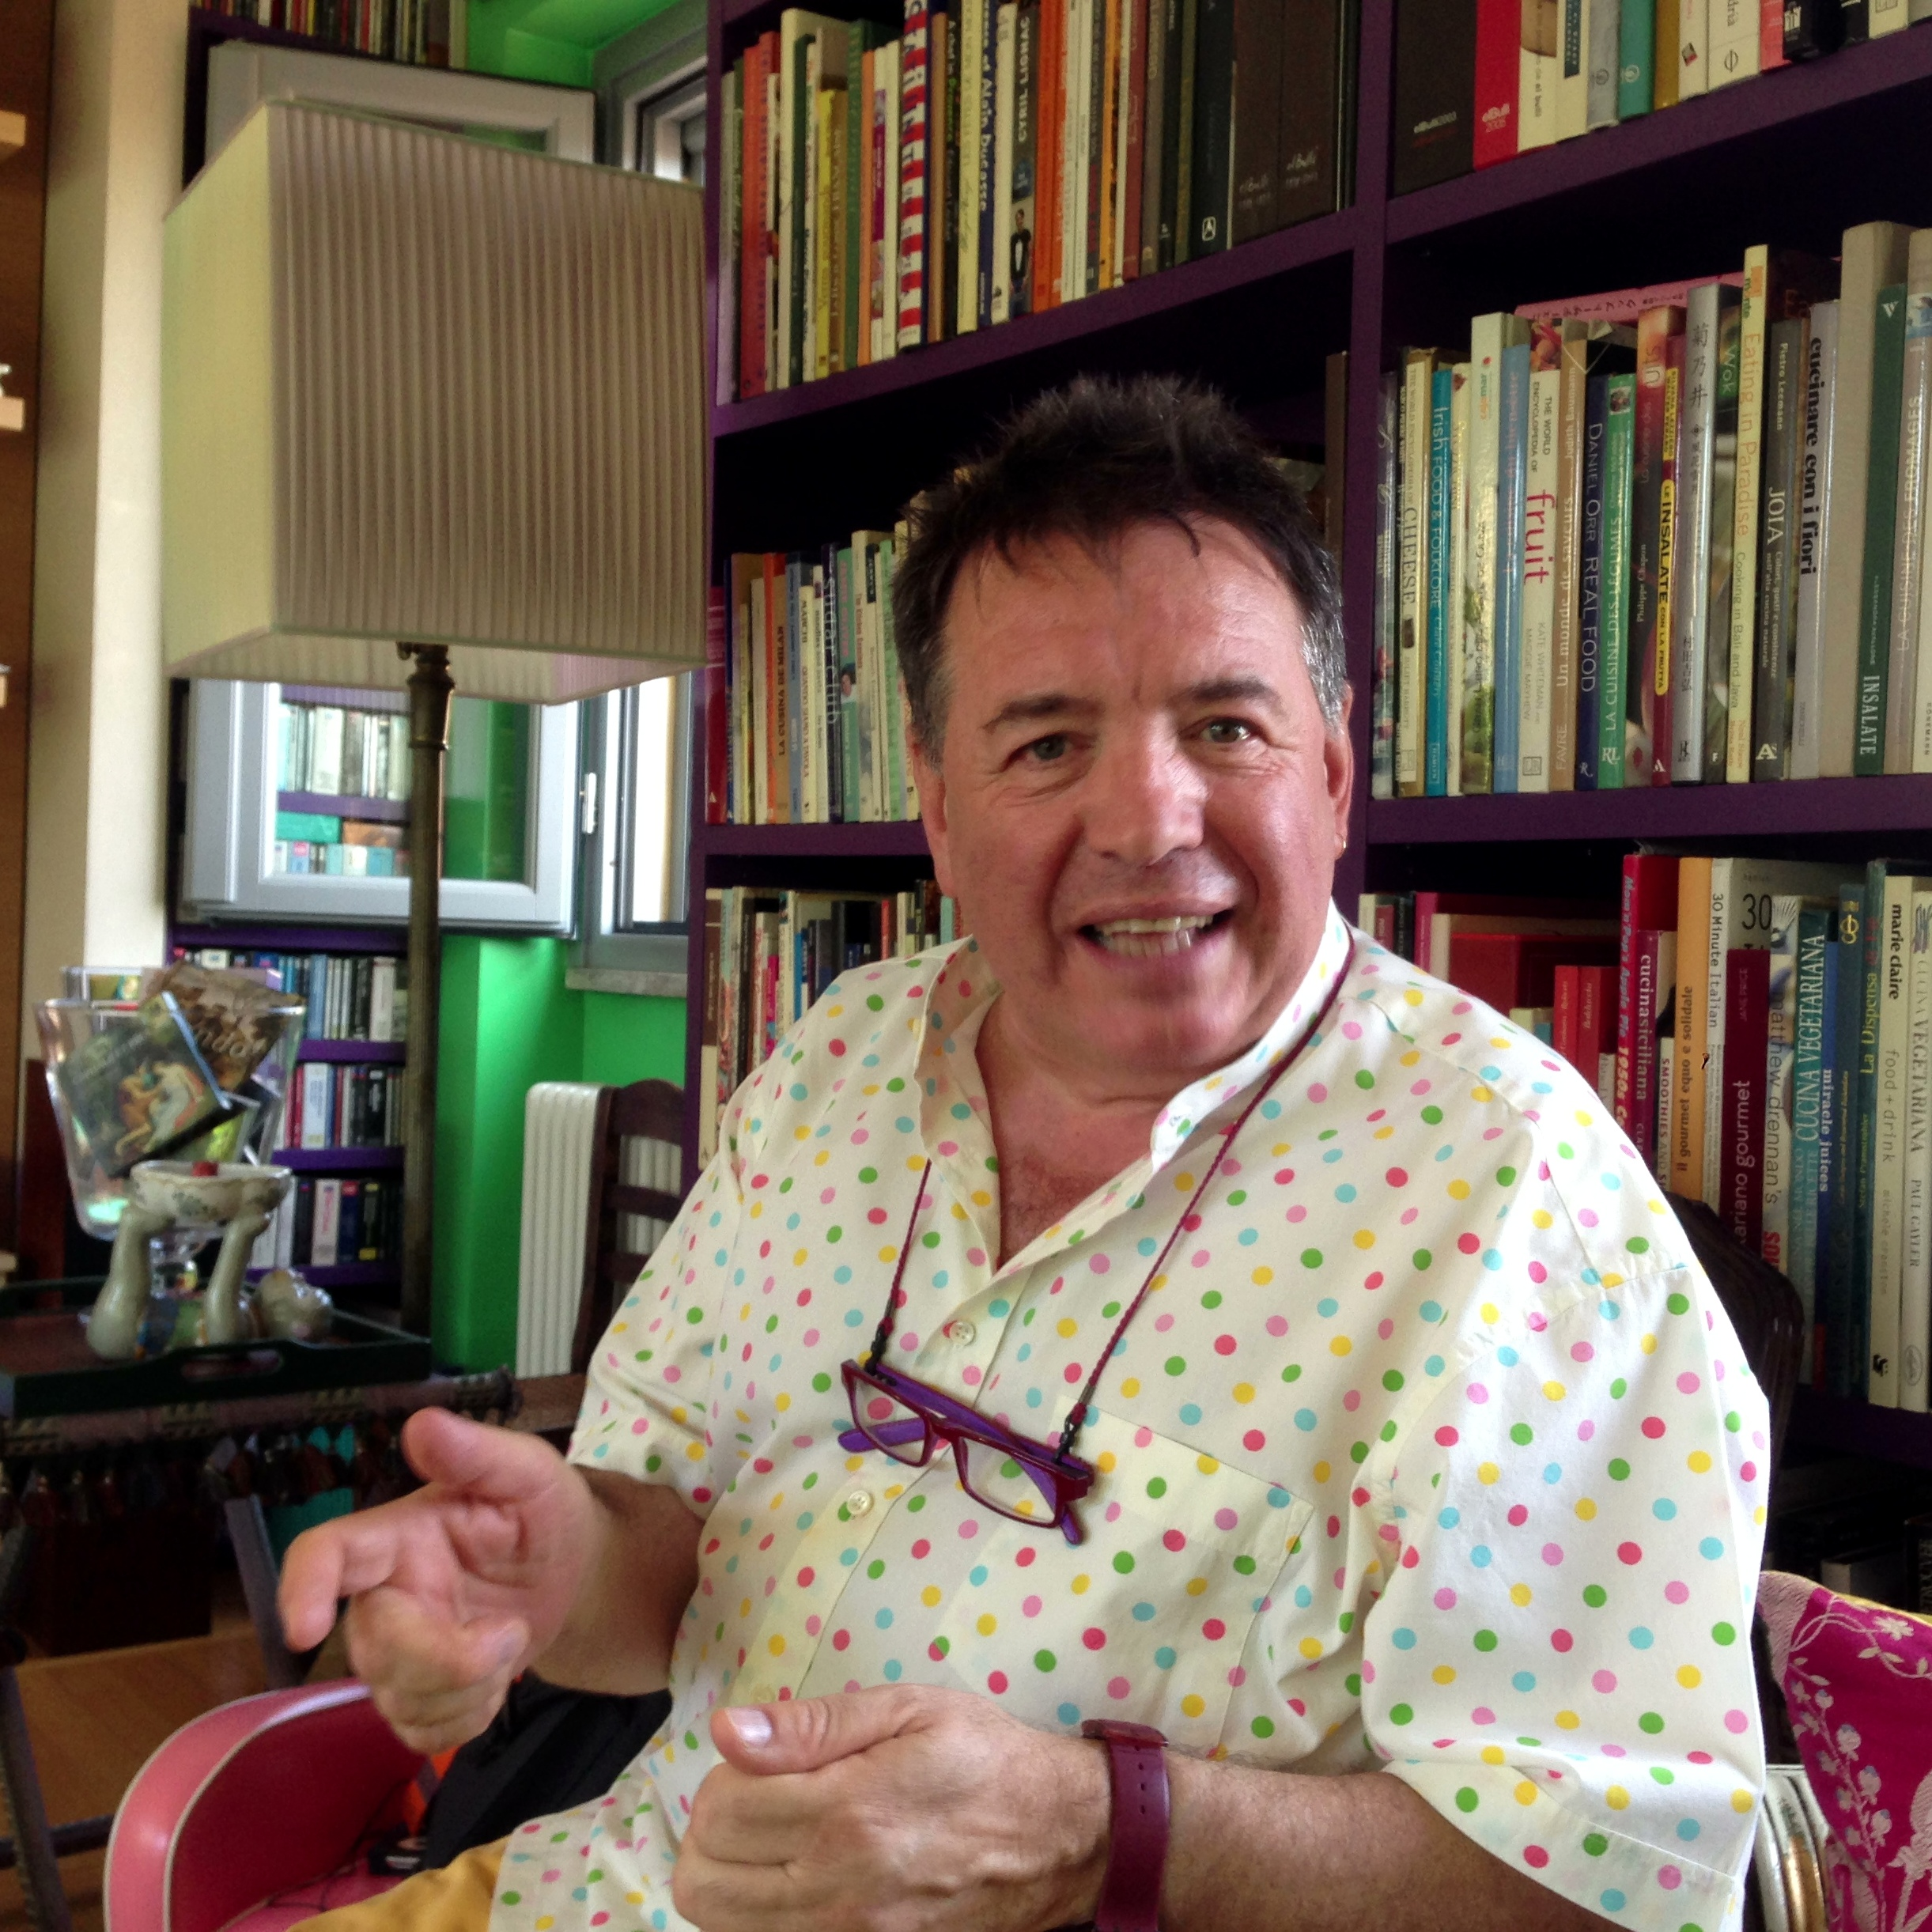 Cucina Fusion: I Veri Pionieri Della Cucina Fusion: Intervista A Ivan